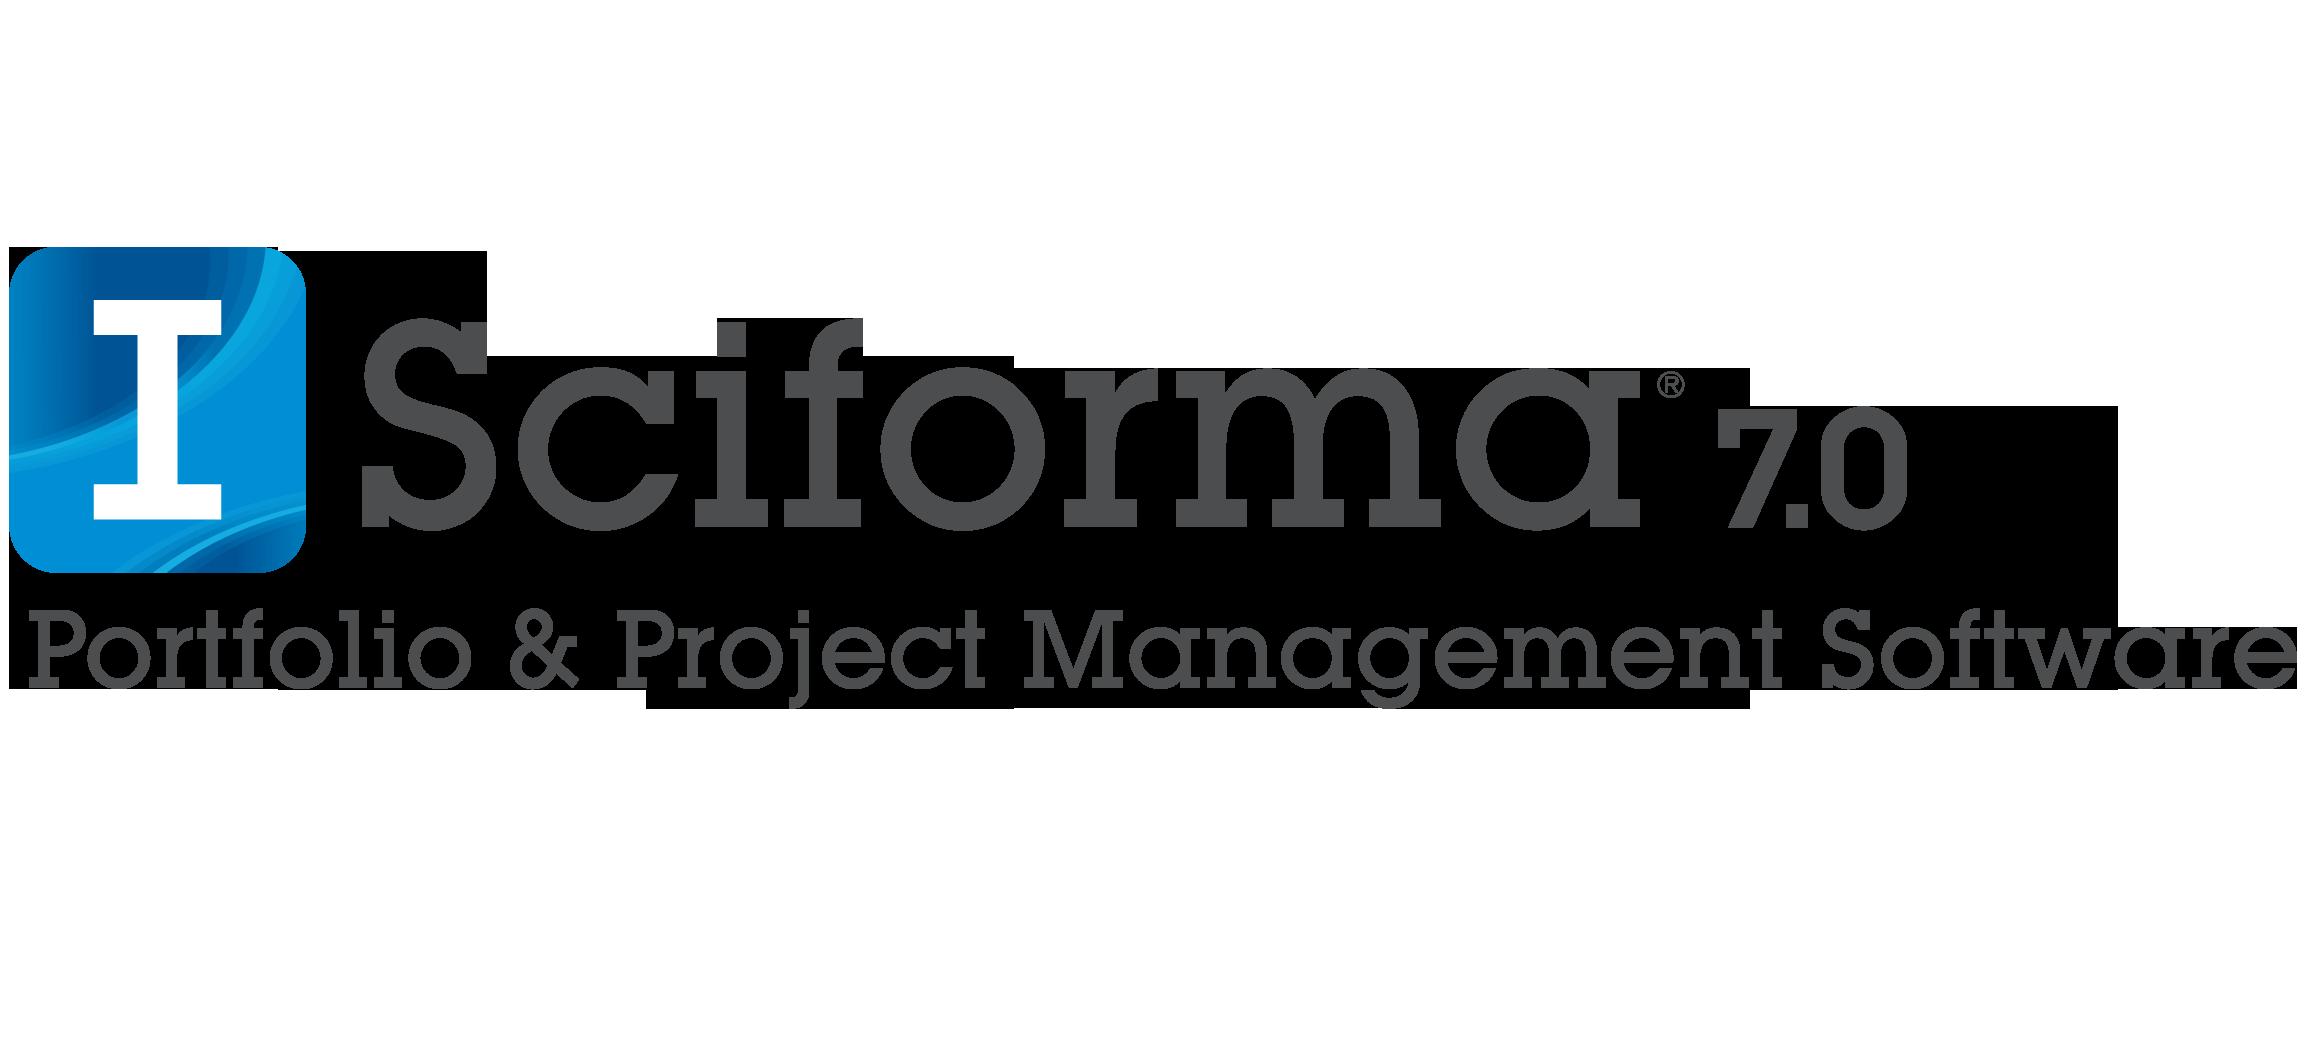 sciforma-logo_2.png